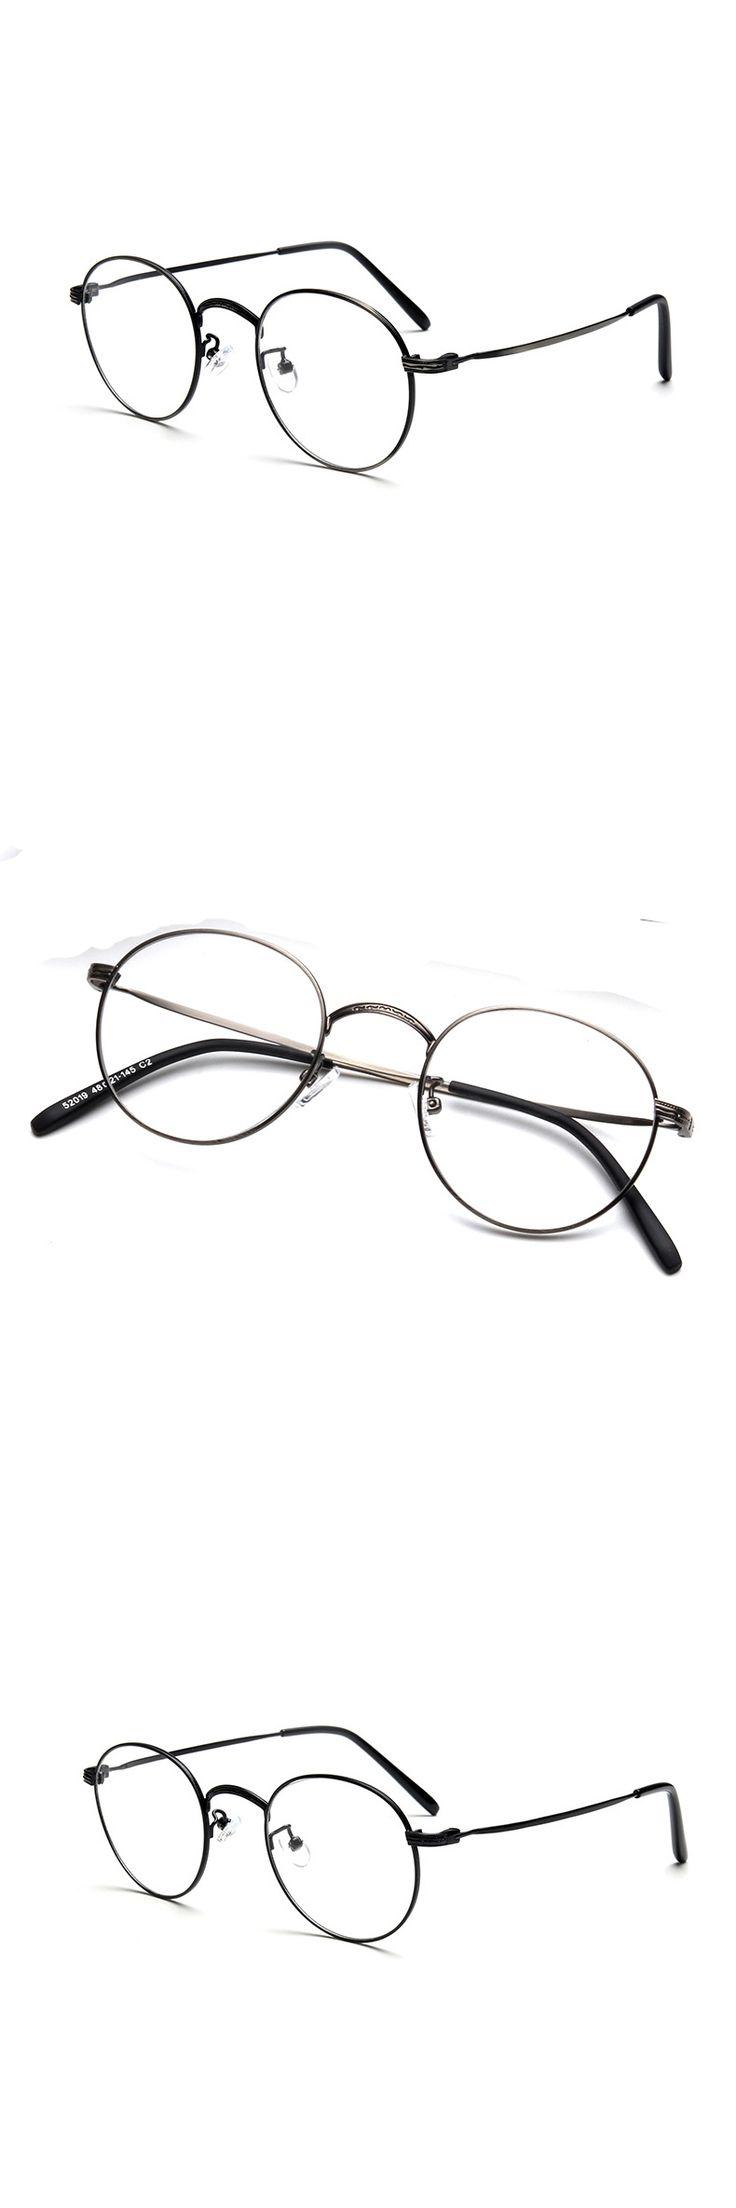 Men brand eyeglasses wholesale vintage optical eyewear glasses frame 2017 New spectacle frame computer clear glasses 52019